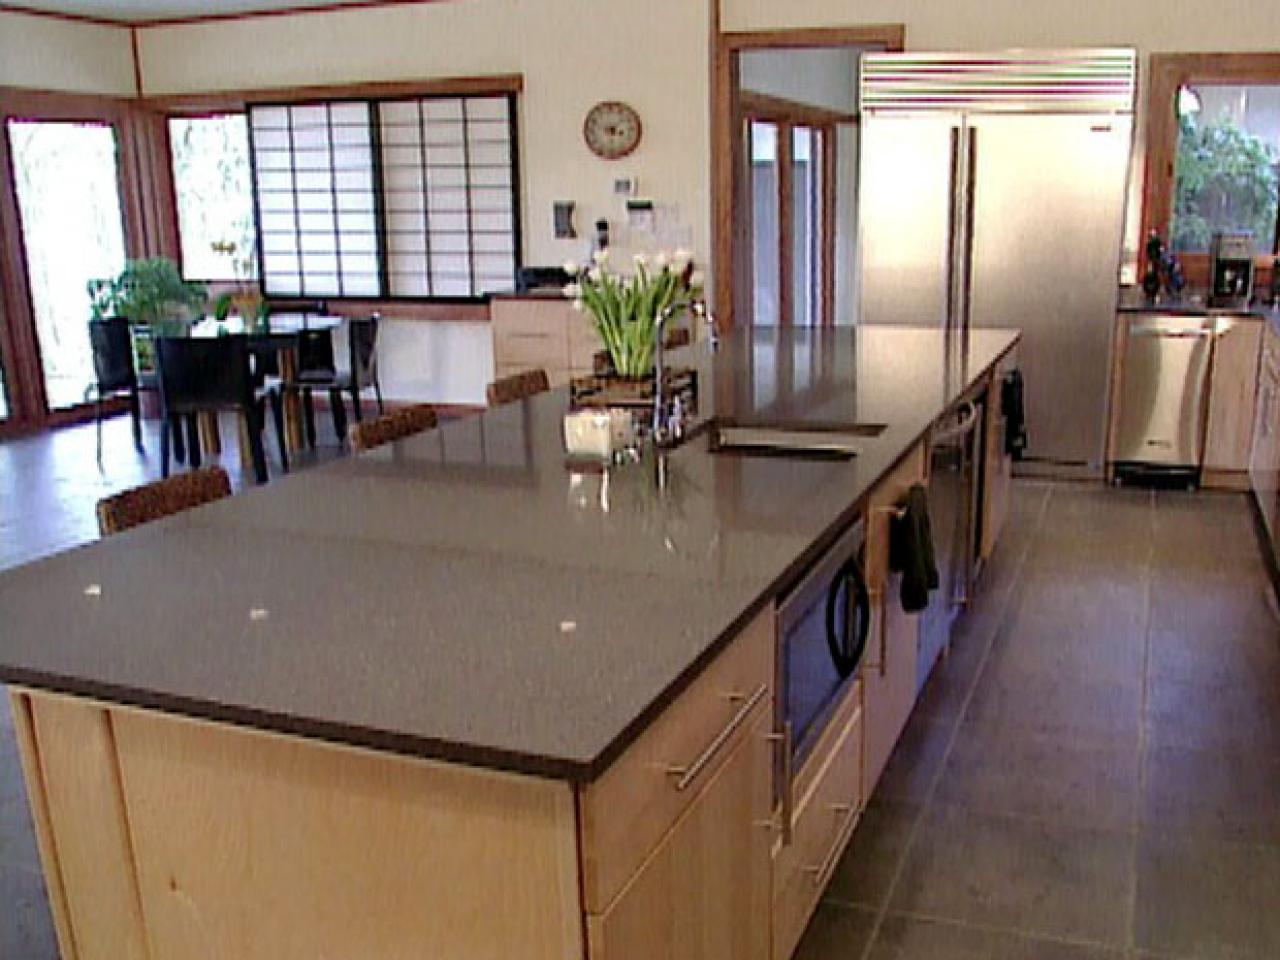 zen kitchen design photos photo - 7